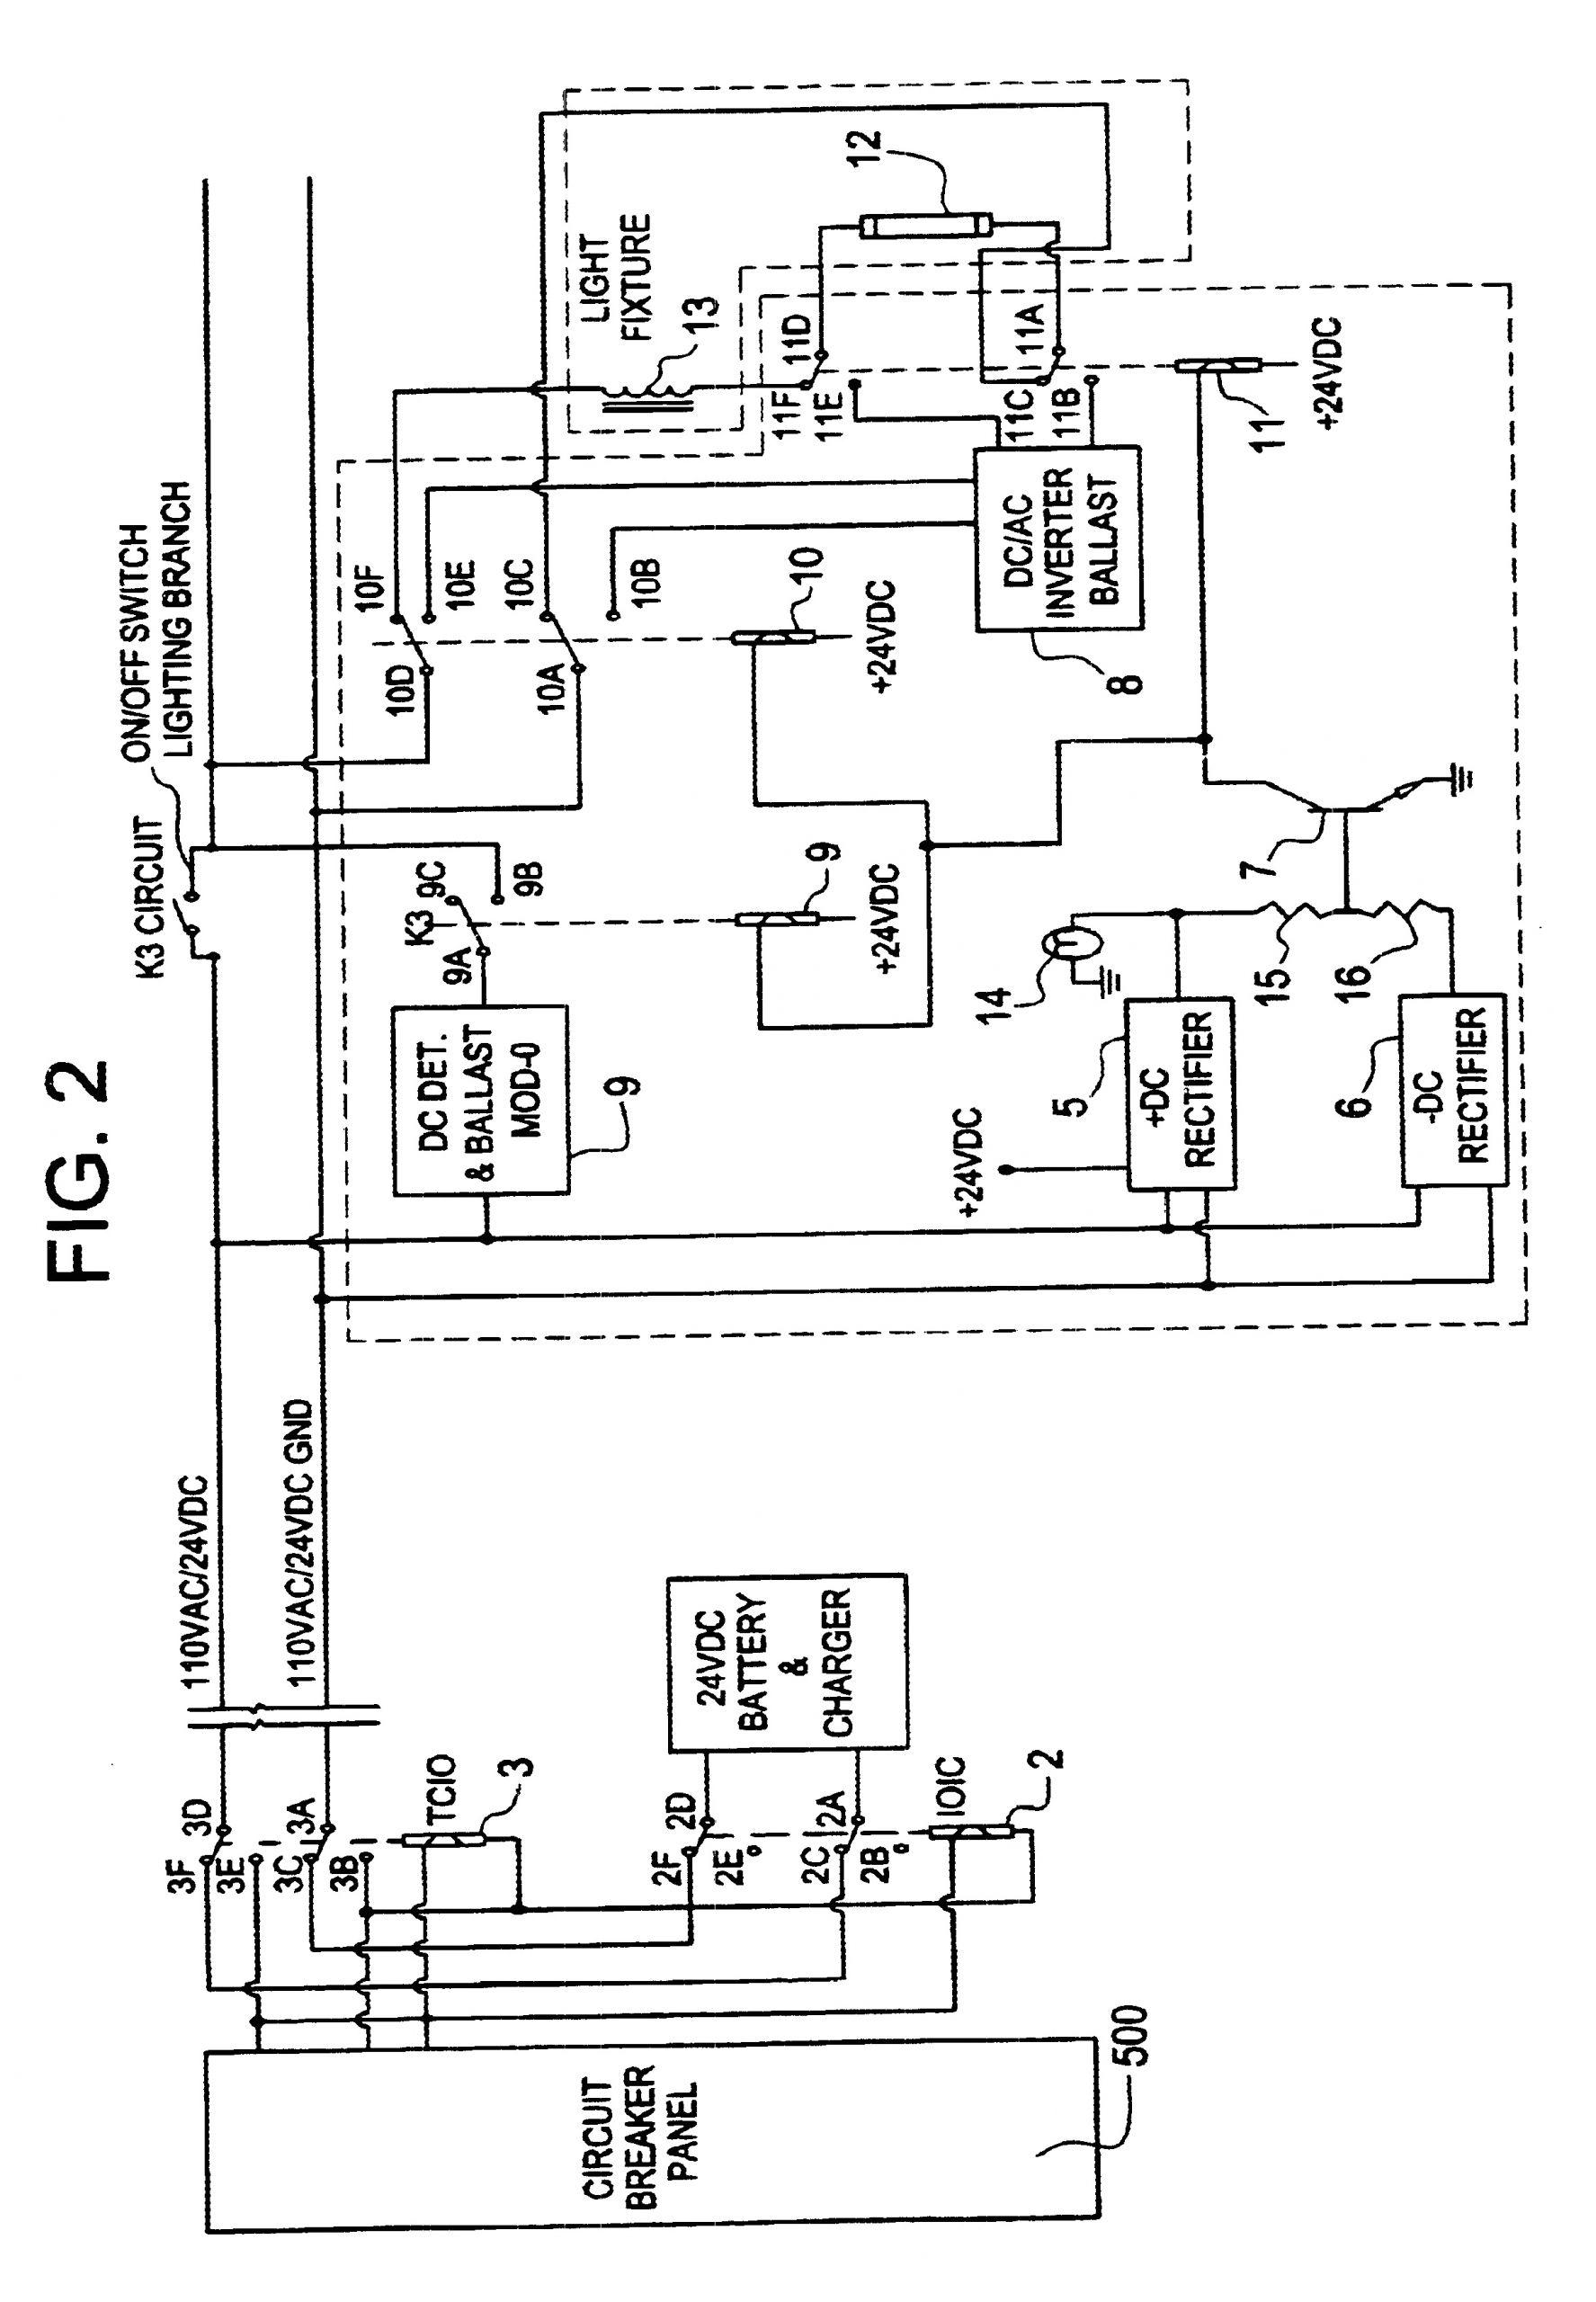 bodine b100 wiring diagram bodine b50 wiring diagram wiring diagram u2022 rh growbyte co philips bodine emergency wiring diagram 20k jpg